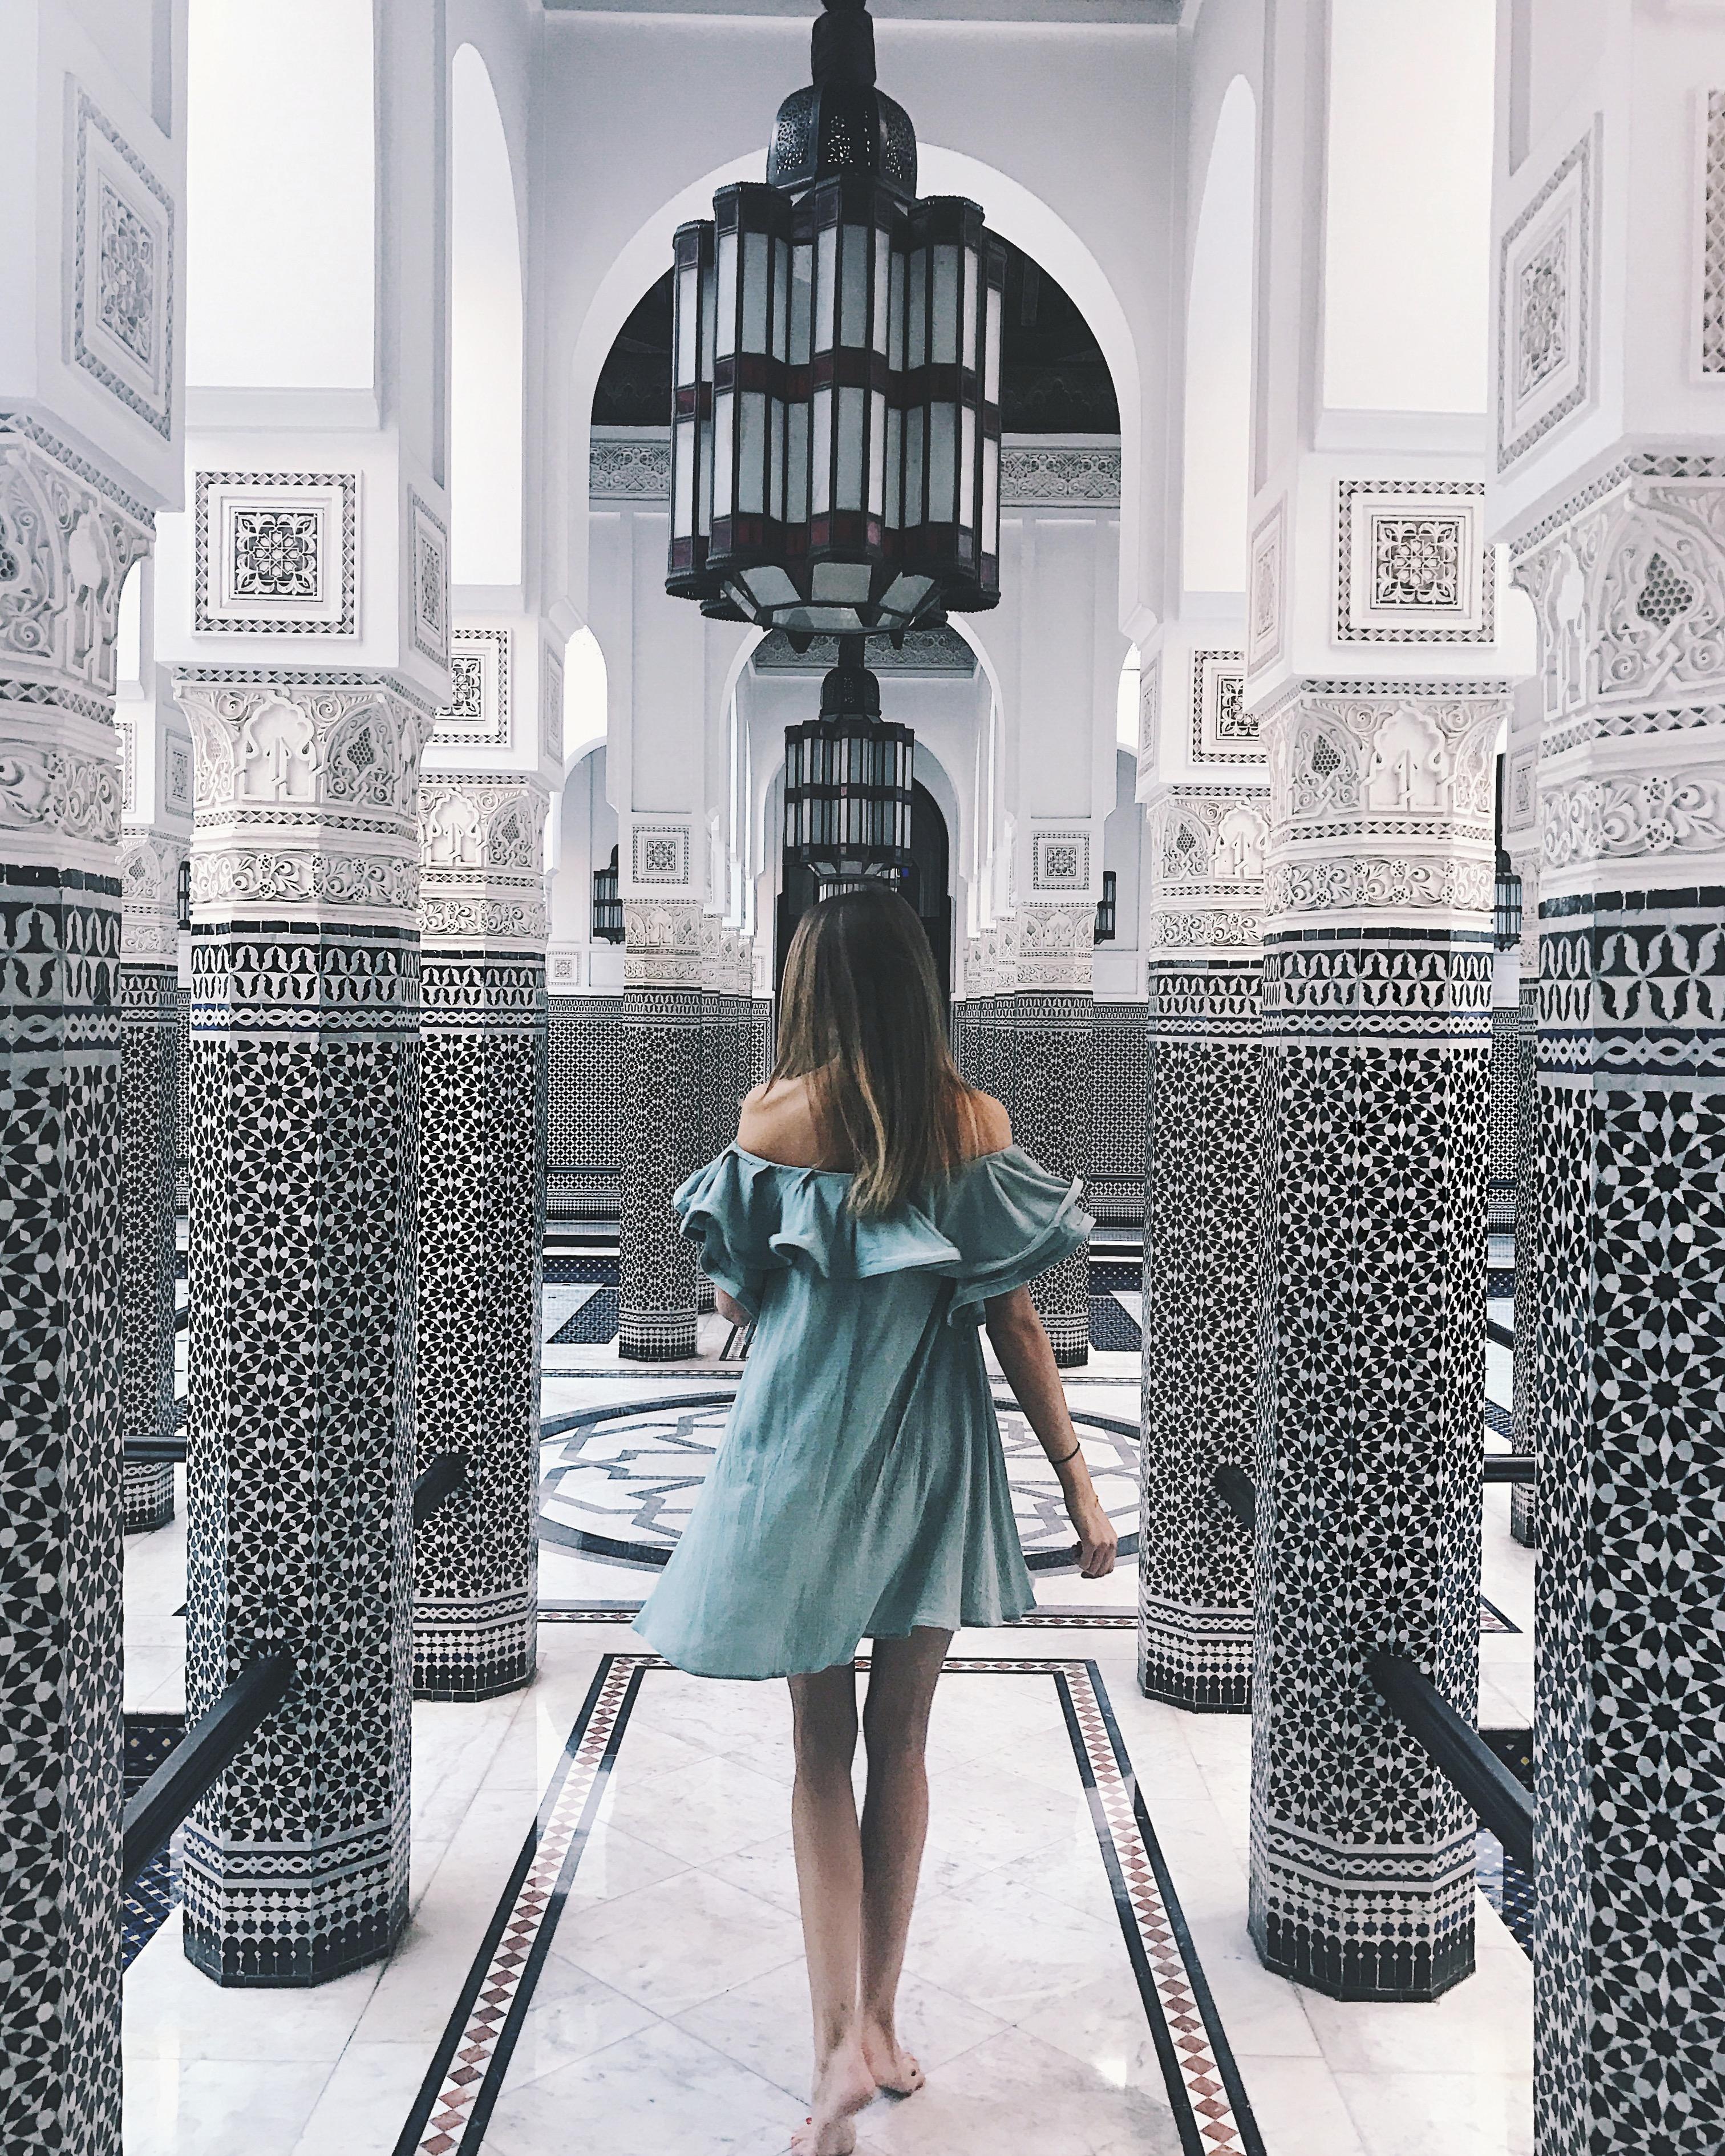 linda_tsetis_worlds_affair_travel_marrakech_hotel_la_mamounia